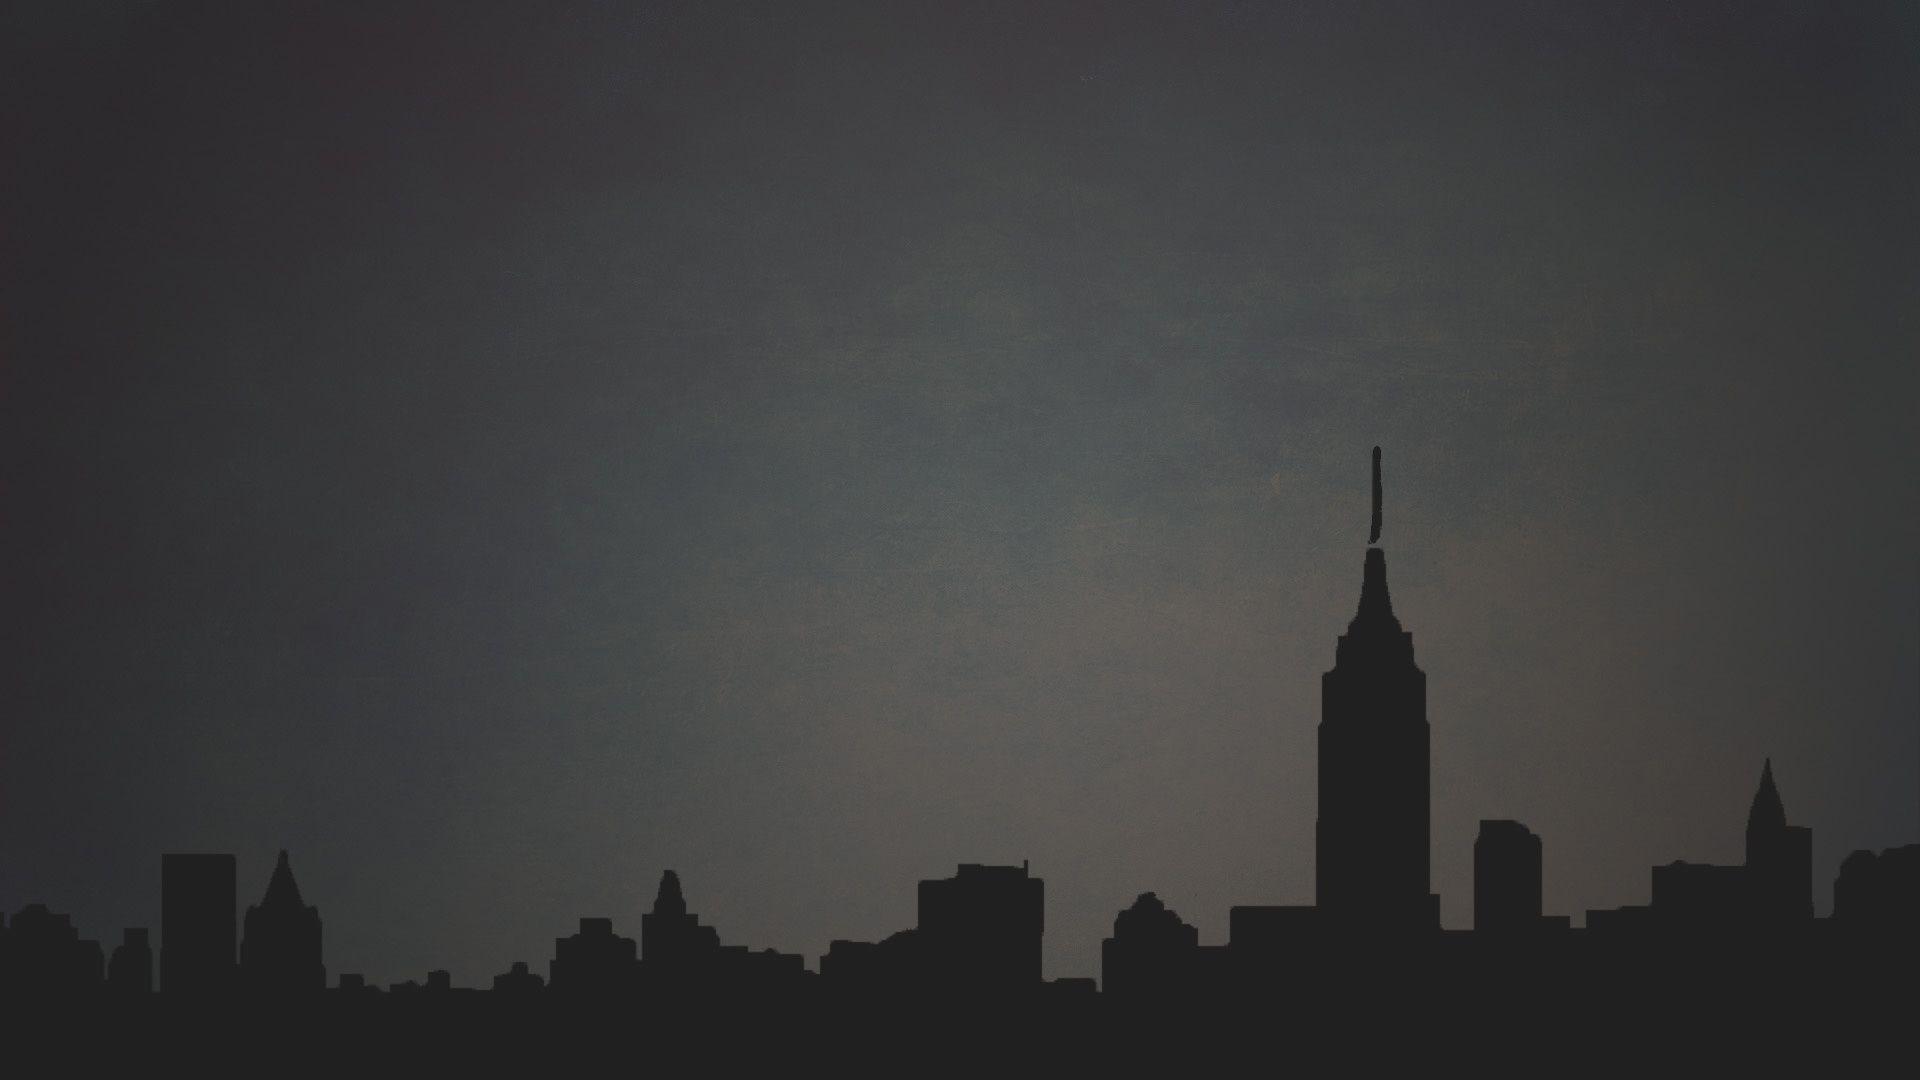 дома минимализм тень home minimalism shadow без смс